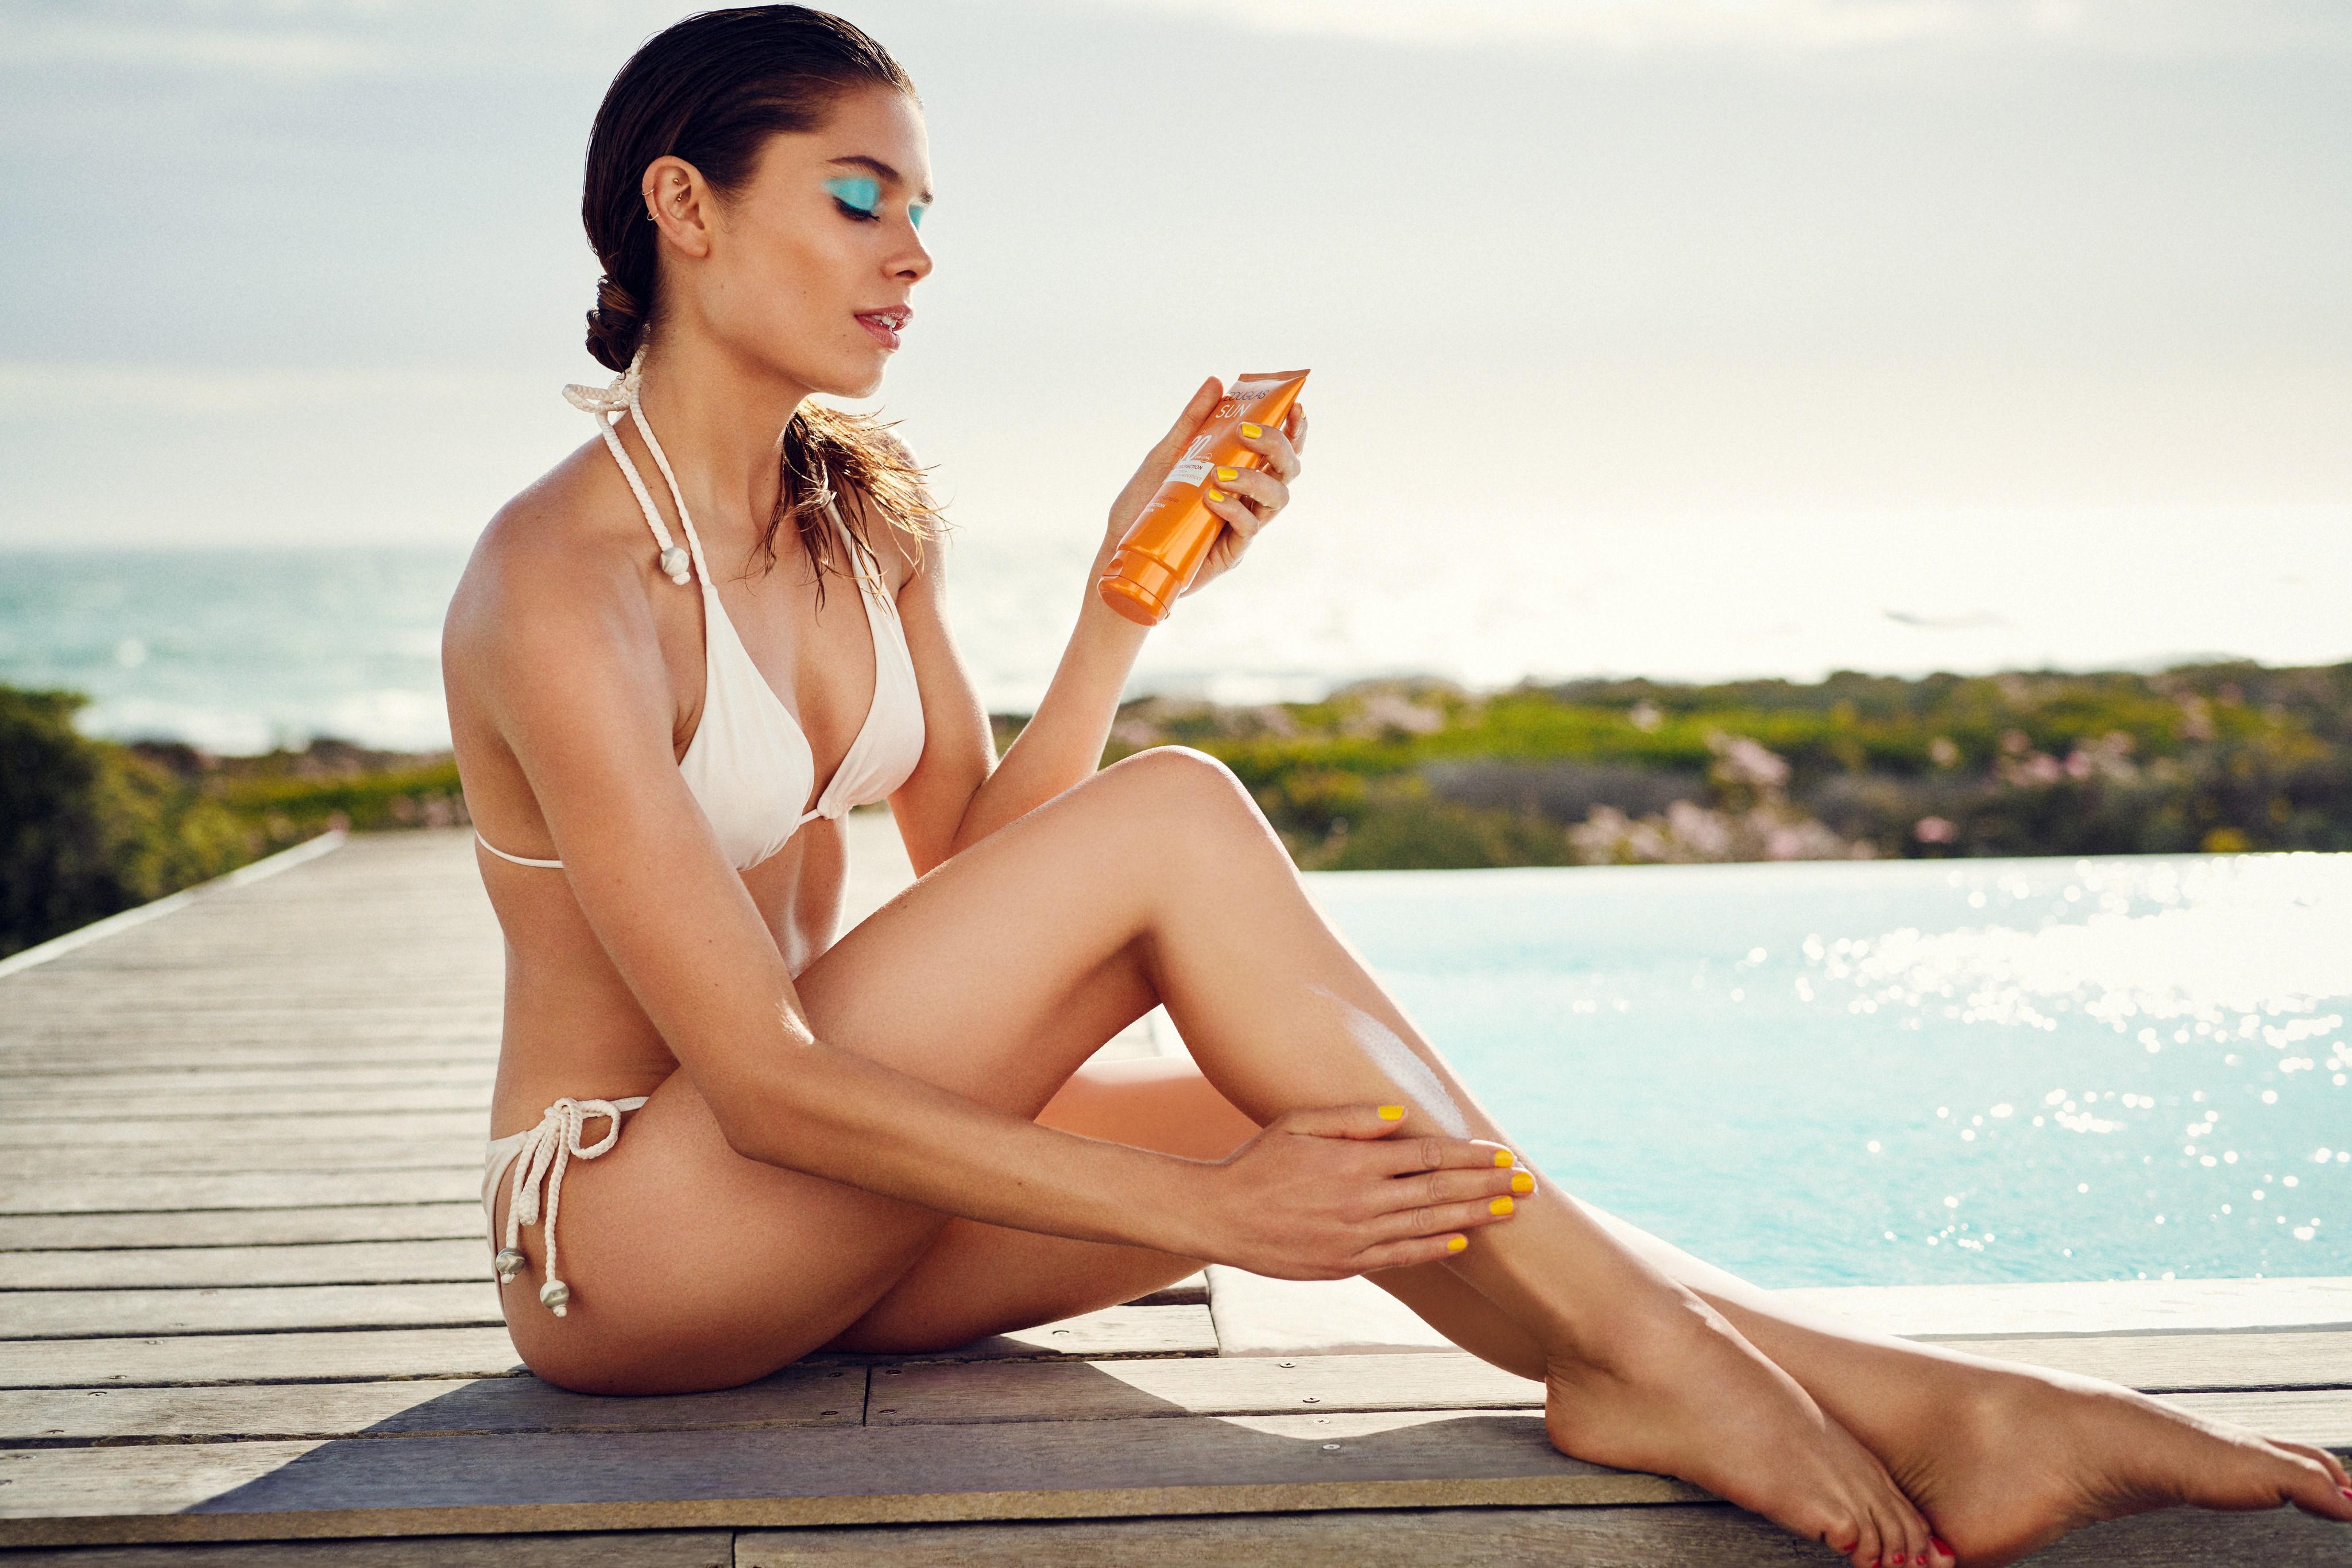 Skincare-beautyvisual-spf-woman-white-bikini-yellow-nails-blue-eyes-062022-Web-Rendition